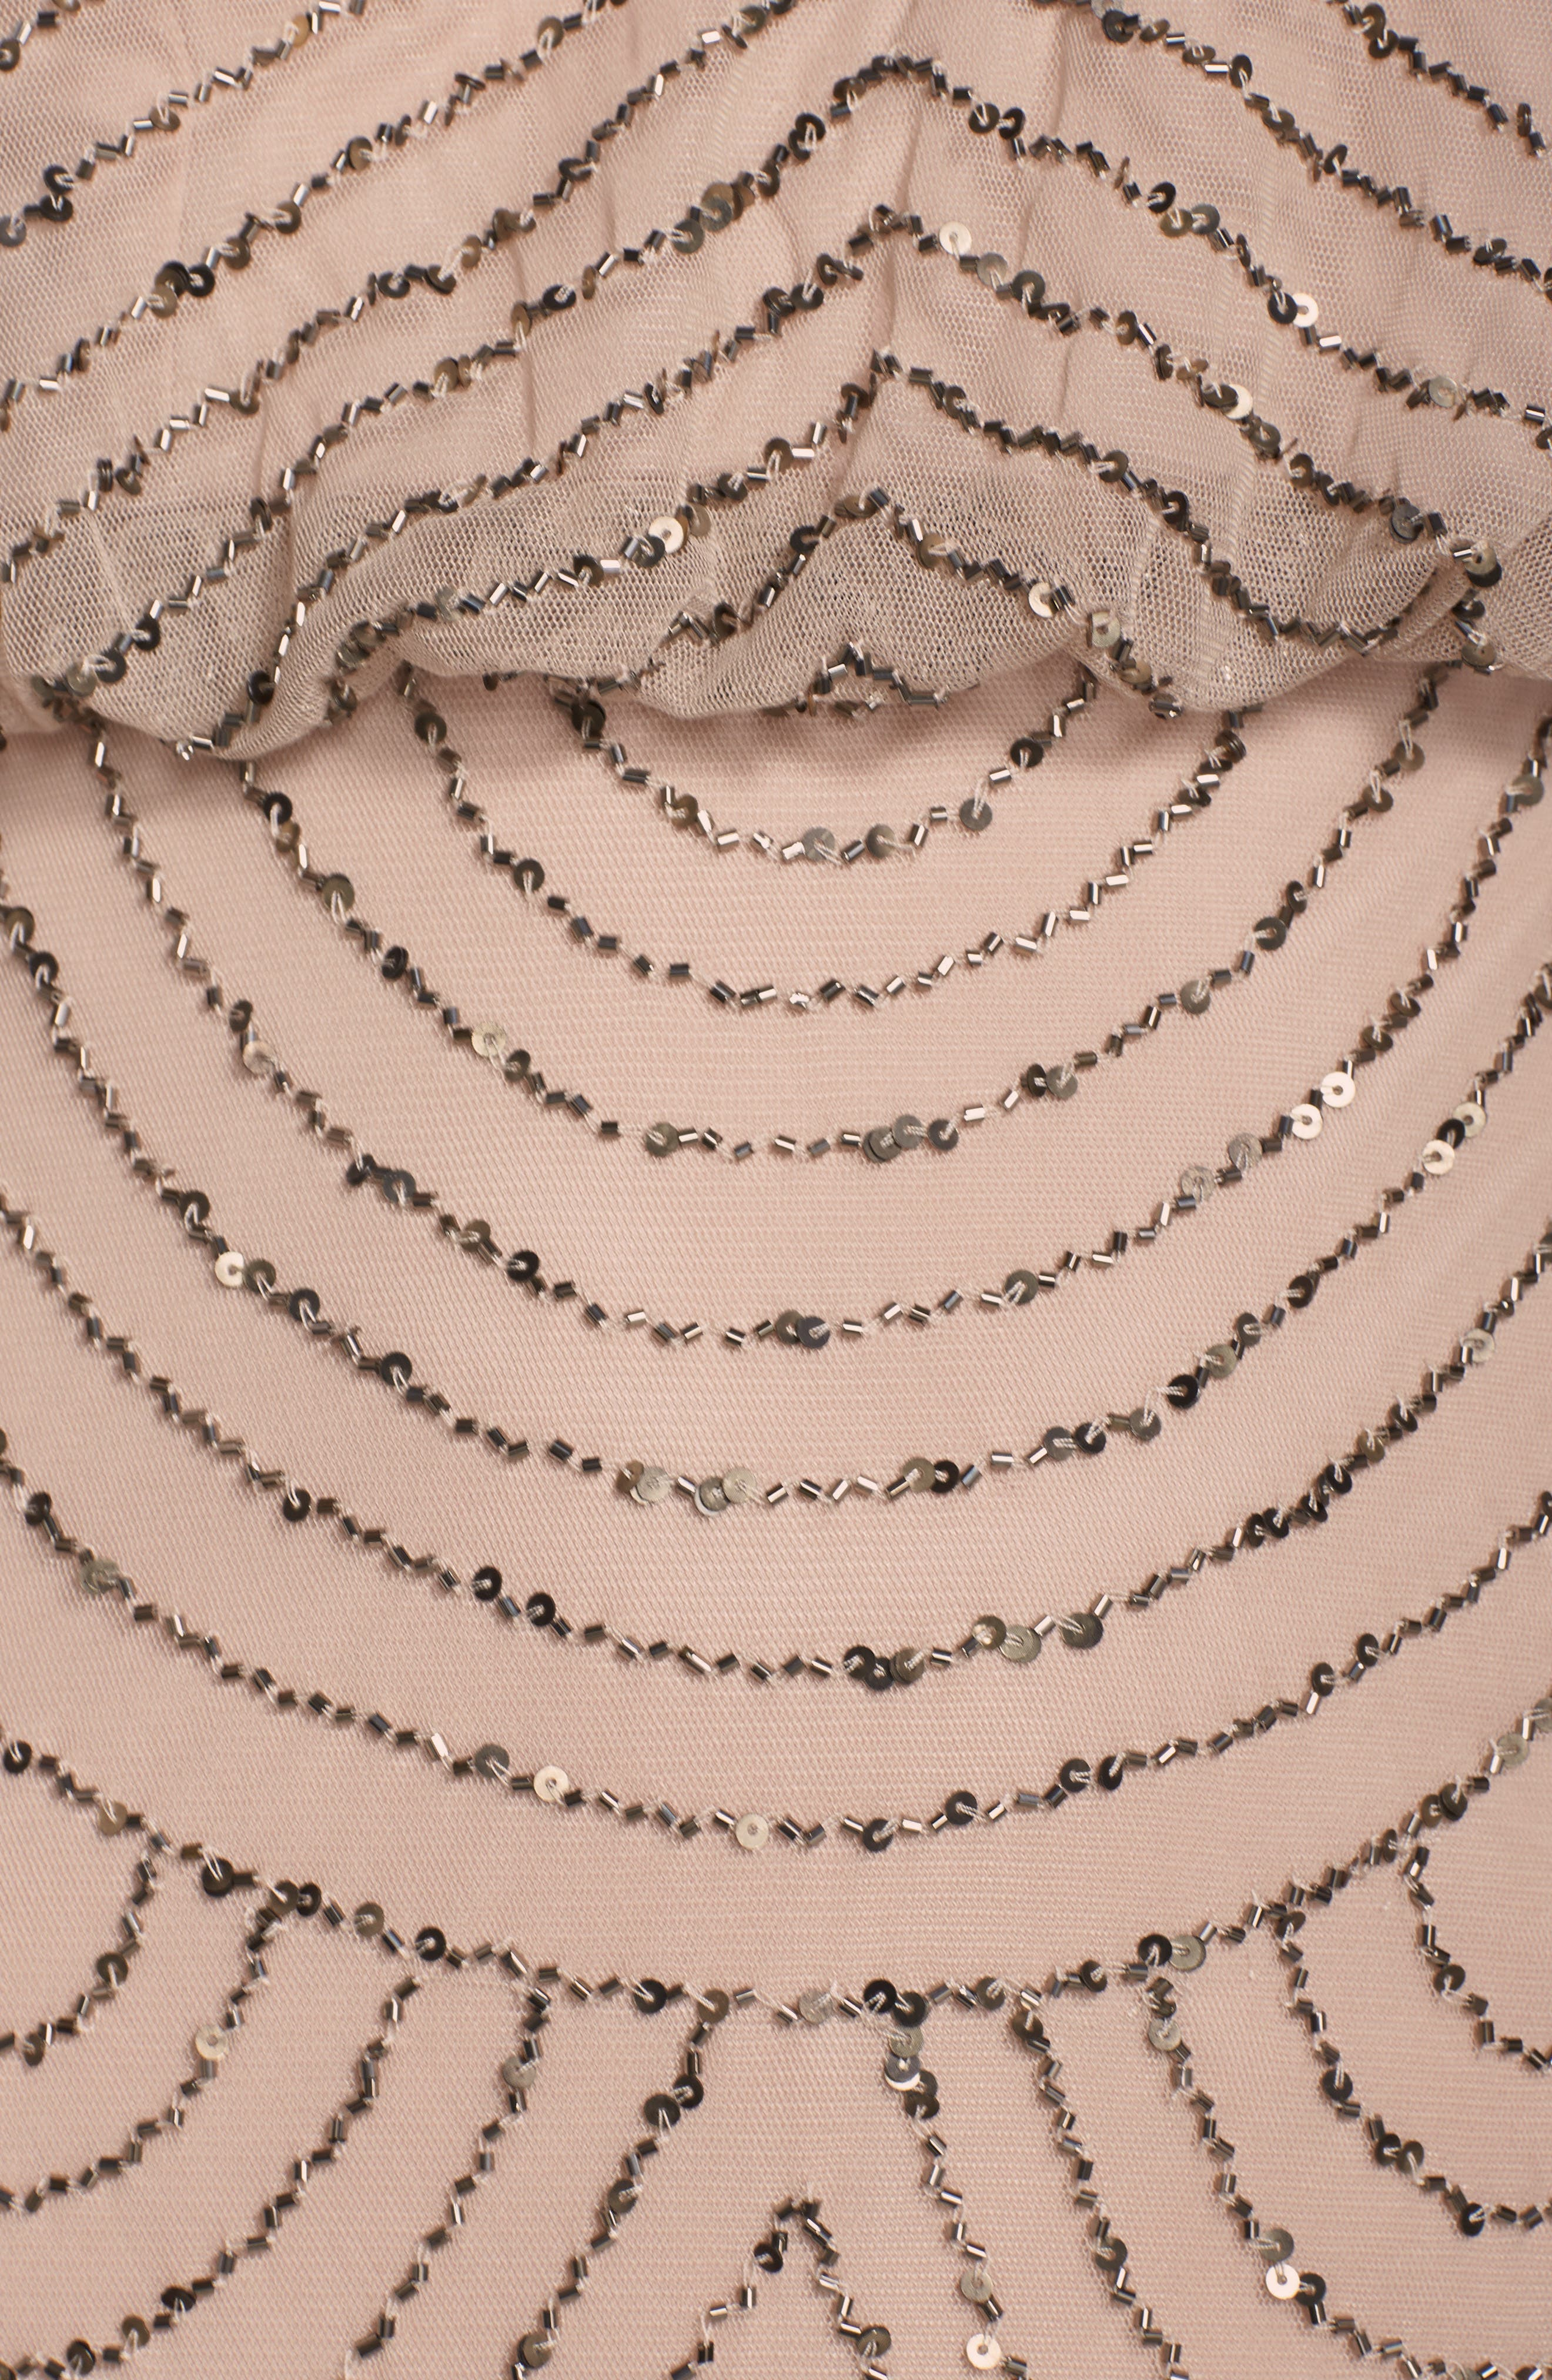 Sequin Mesh Blouson Dress,                             Alternate thumbnail 4, color,                             Taupe/ Pink